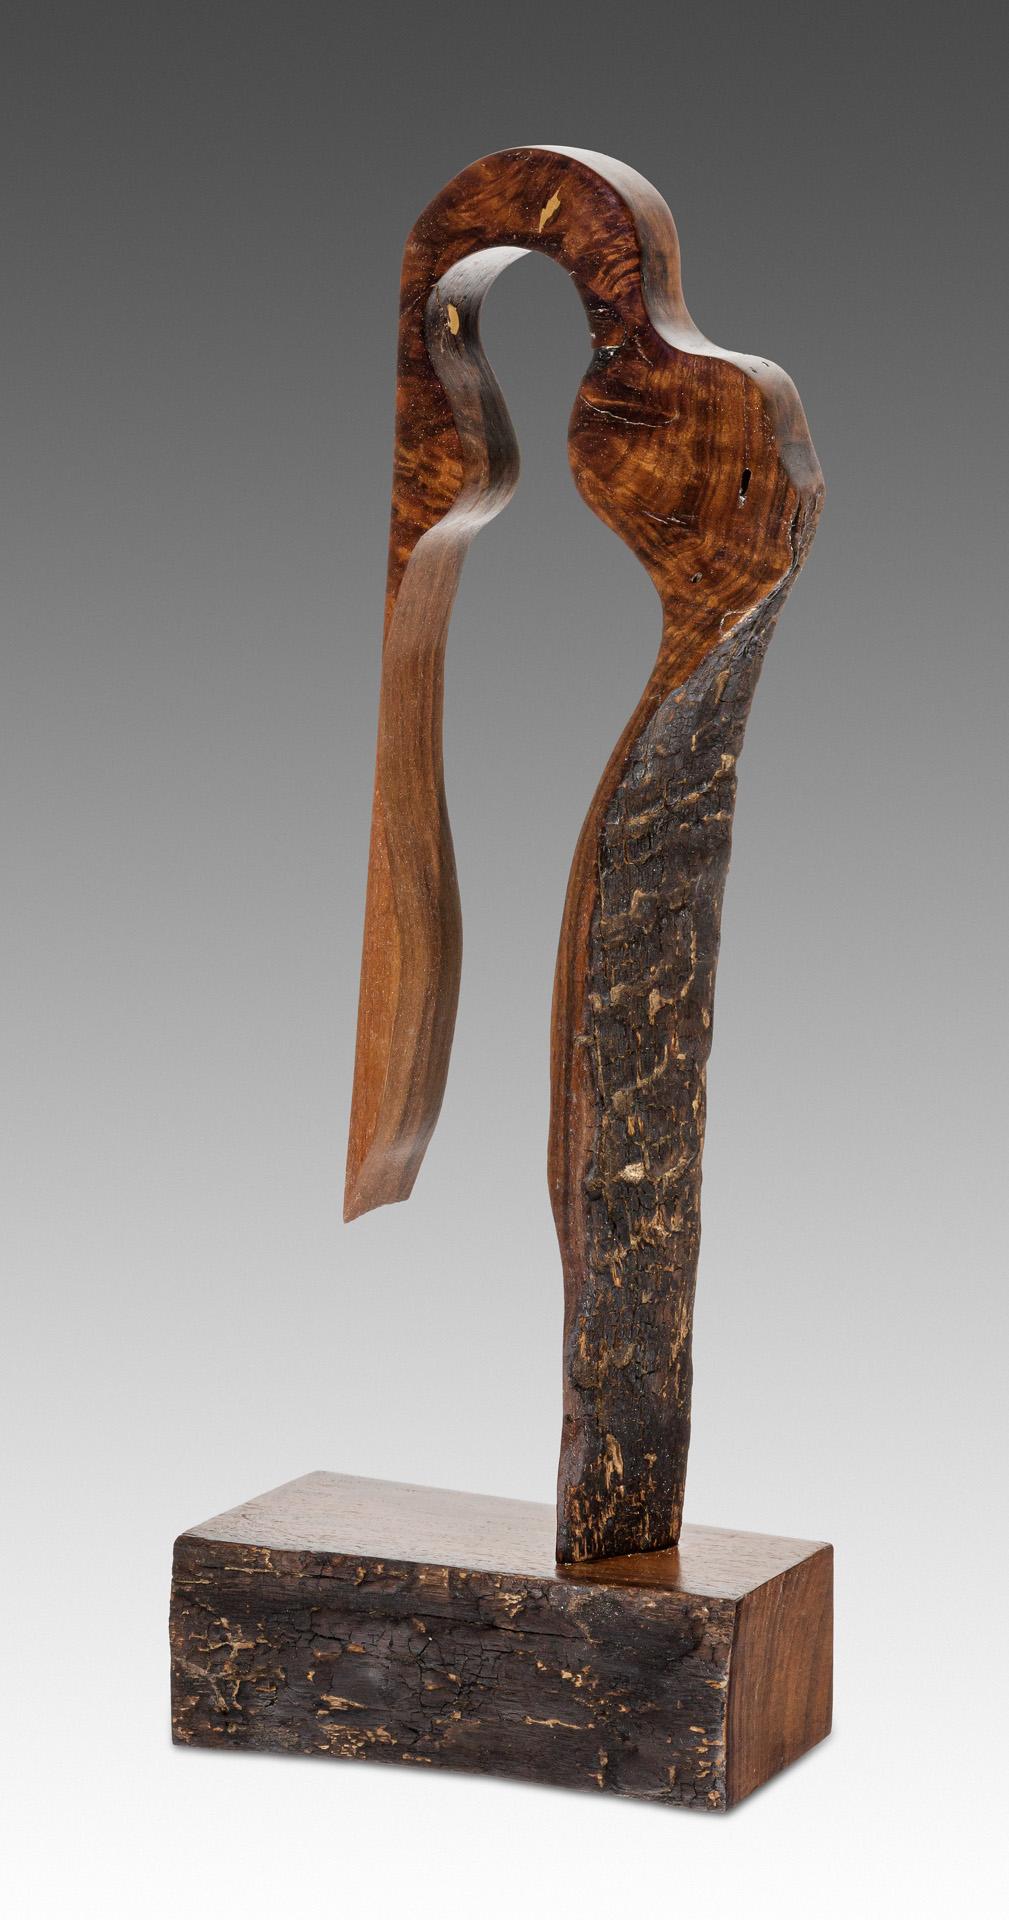 The Looker-sculpture copyright Scott Bruckner